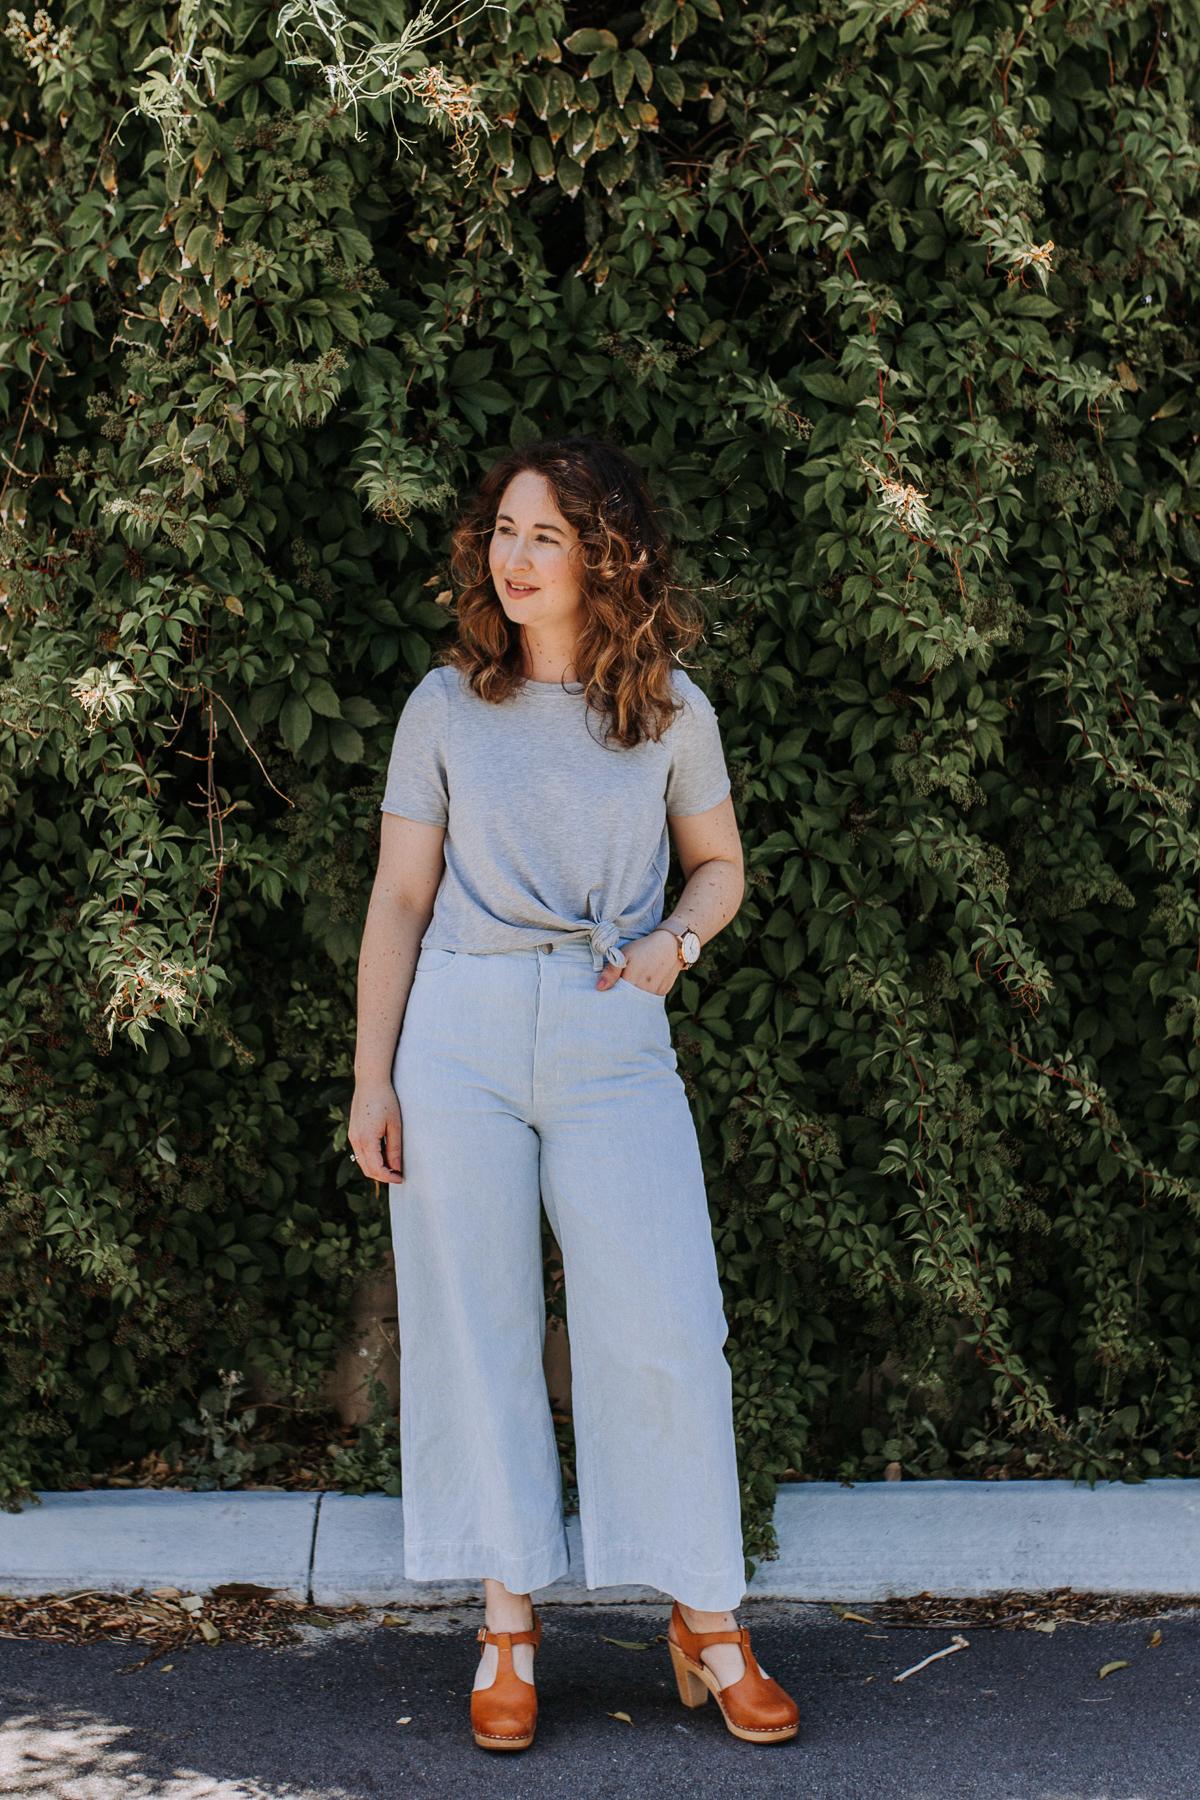 Megan Nielsen wide leg Dawn jeans in light enzyme wash denim + Floreat knit crop top in grey marle